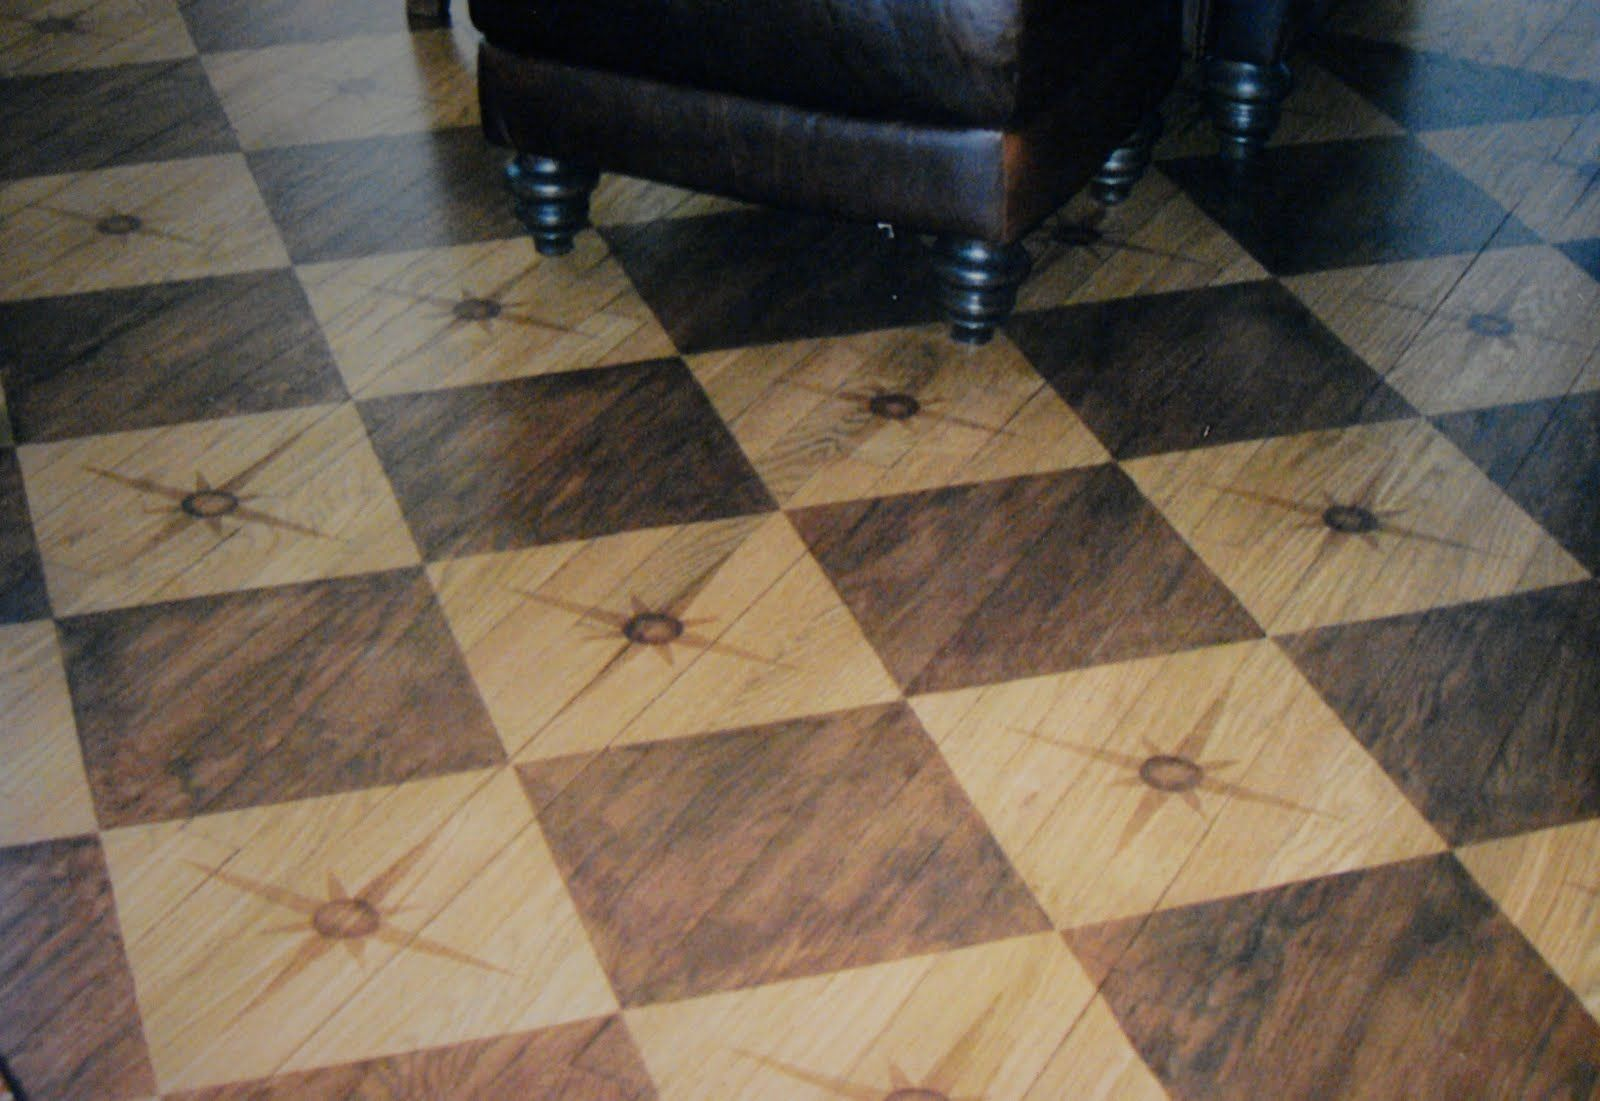 painted plank floors harlequin design   Hardwood flooring painting  snapfiction home and garden Hardwood .